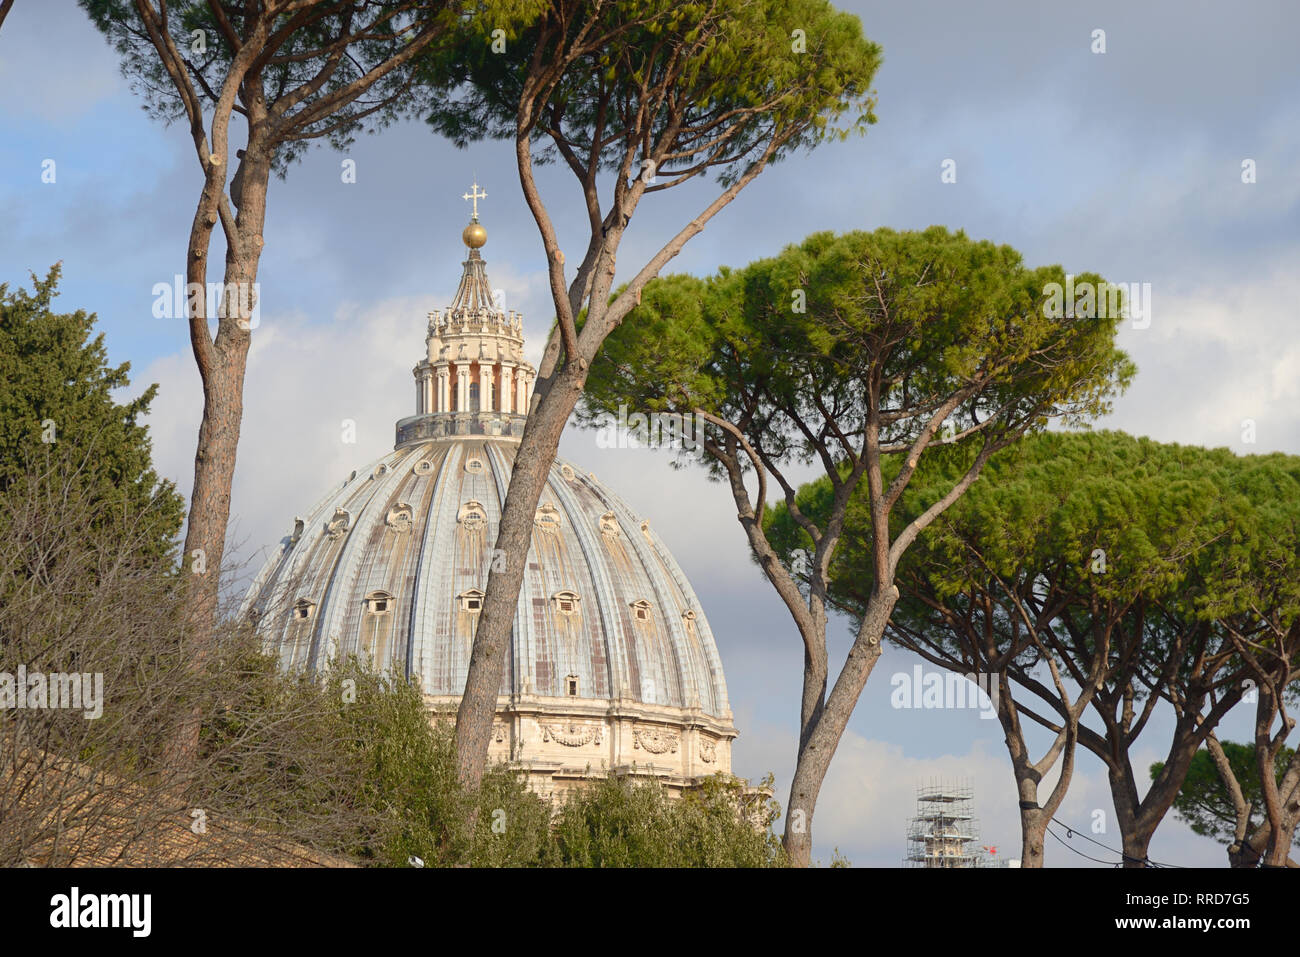 Dome of Saint Peter's Basilica Framed by Umbrella Pines or Italian Stone Pine Trees, Pinus pinea - Stock Image